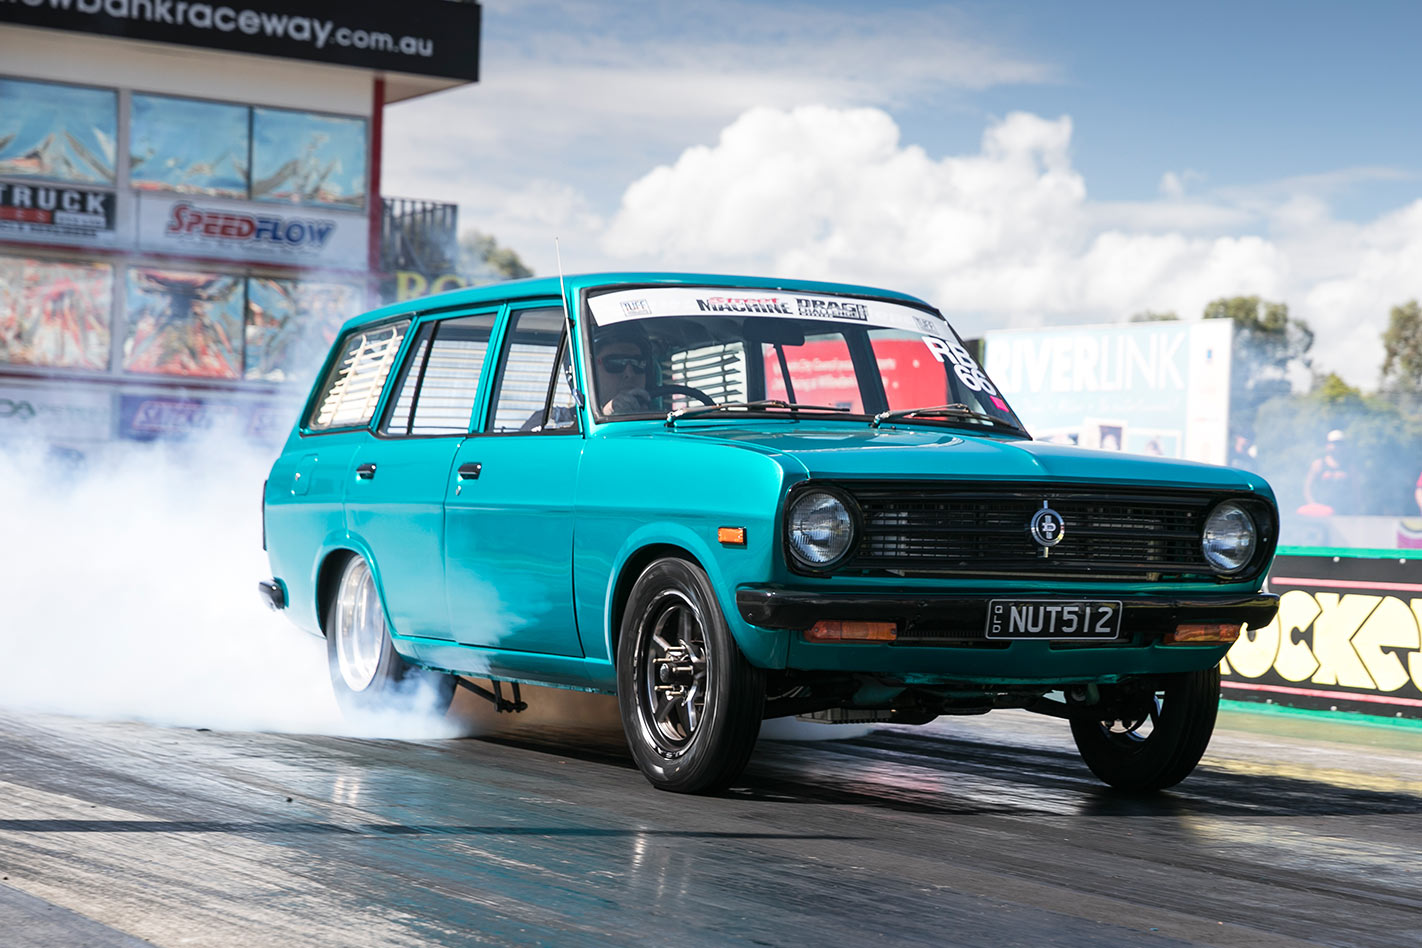 Datsun at drag challenge weekend